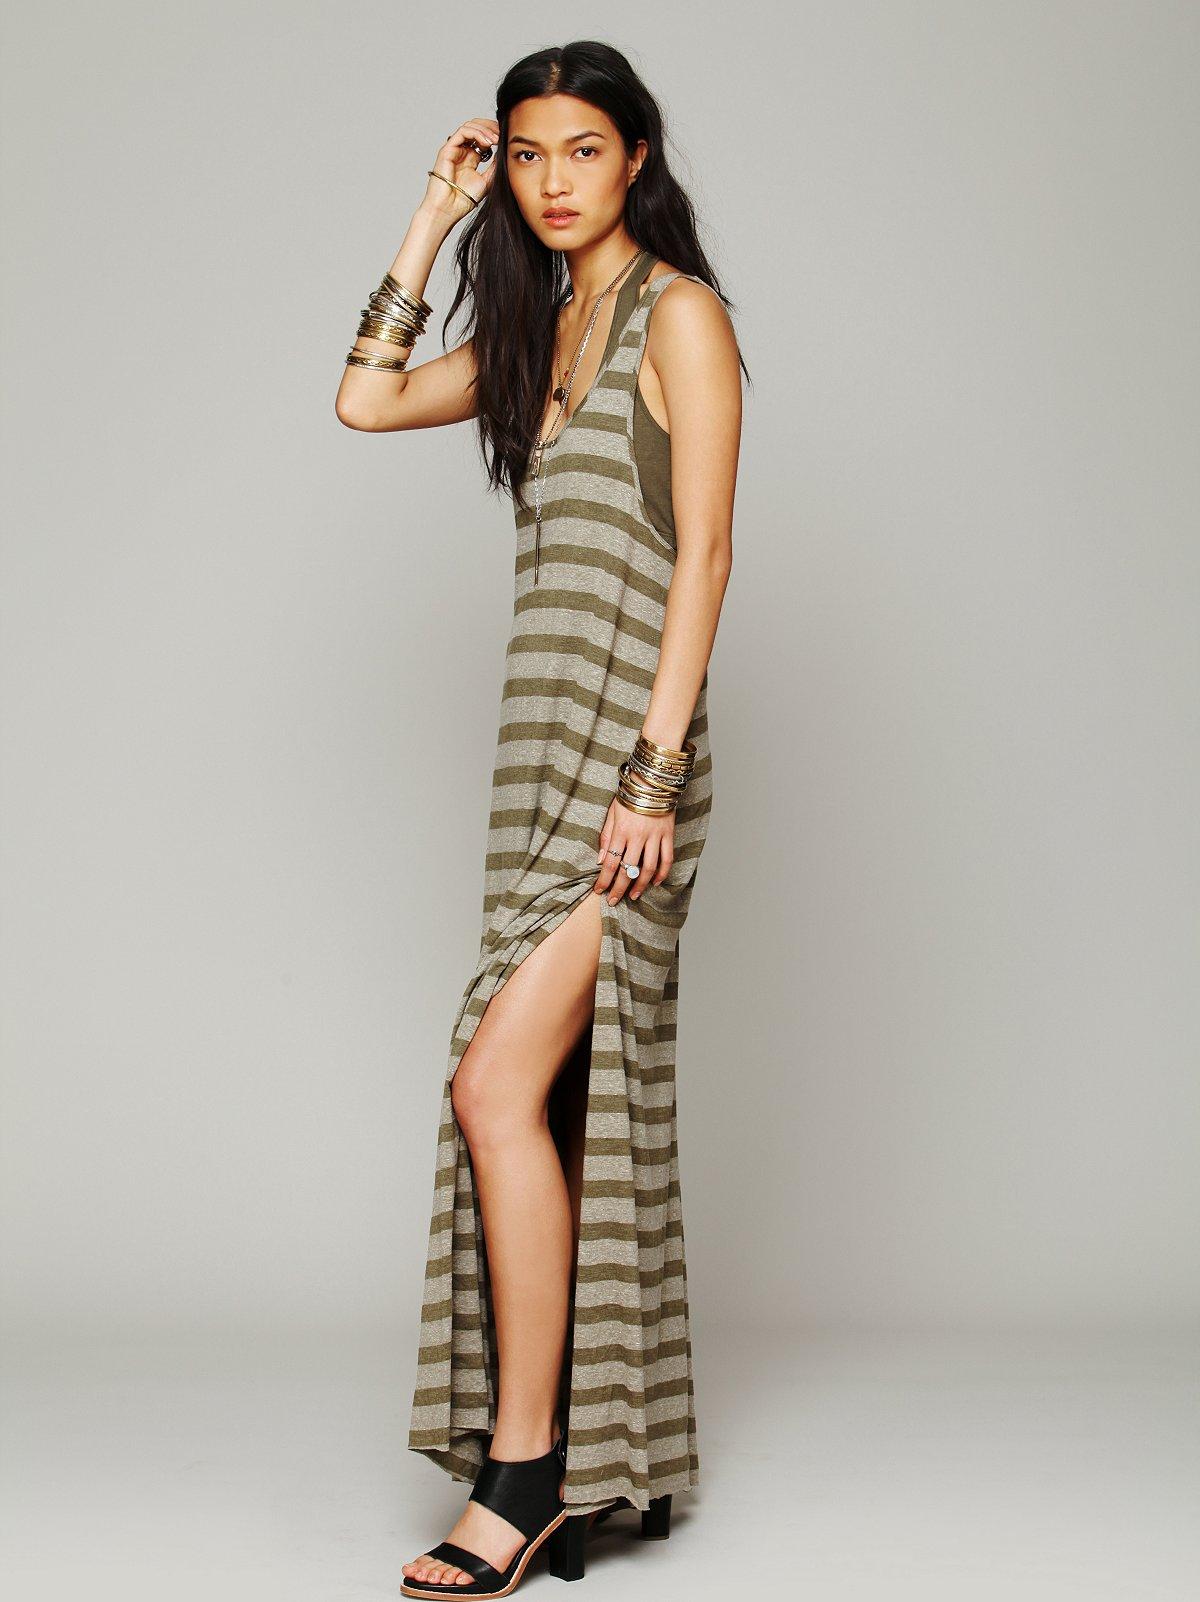 Balneario Beaches Dress